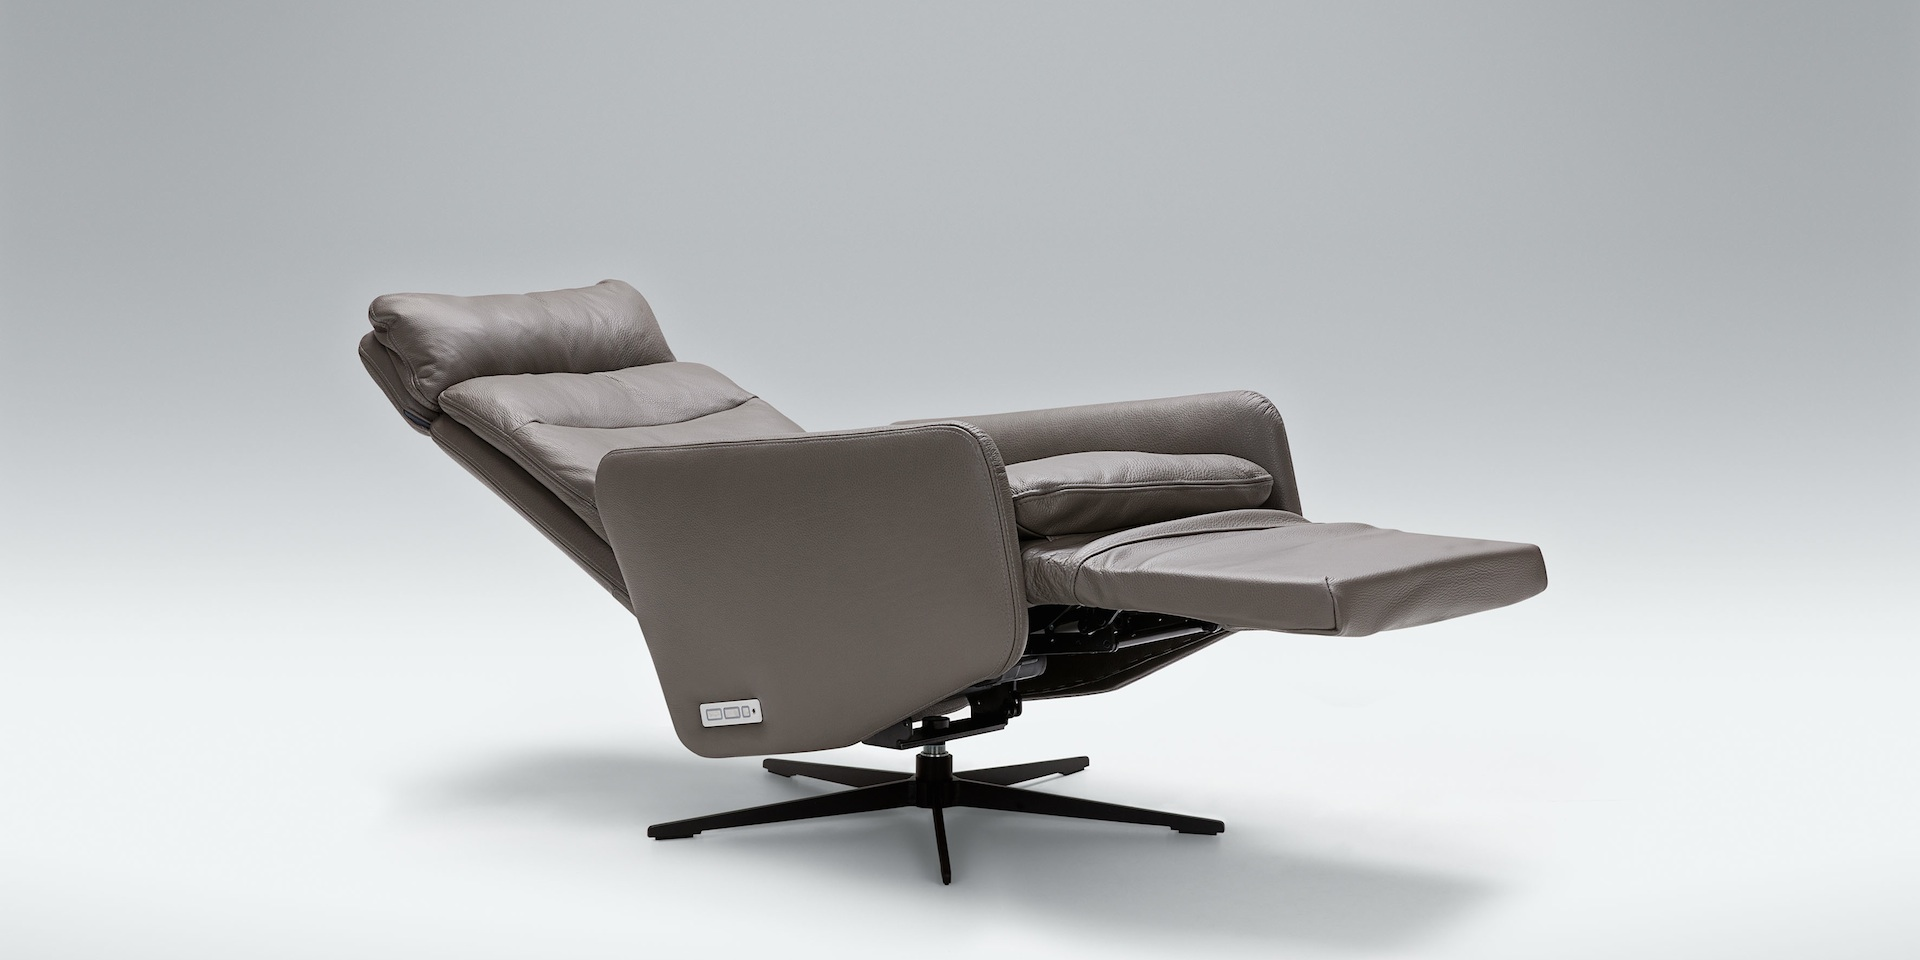 LIV_RELAX_shadow_armchair_touch5_dark_grey_3